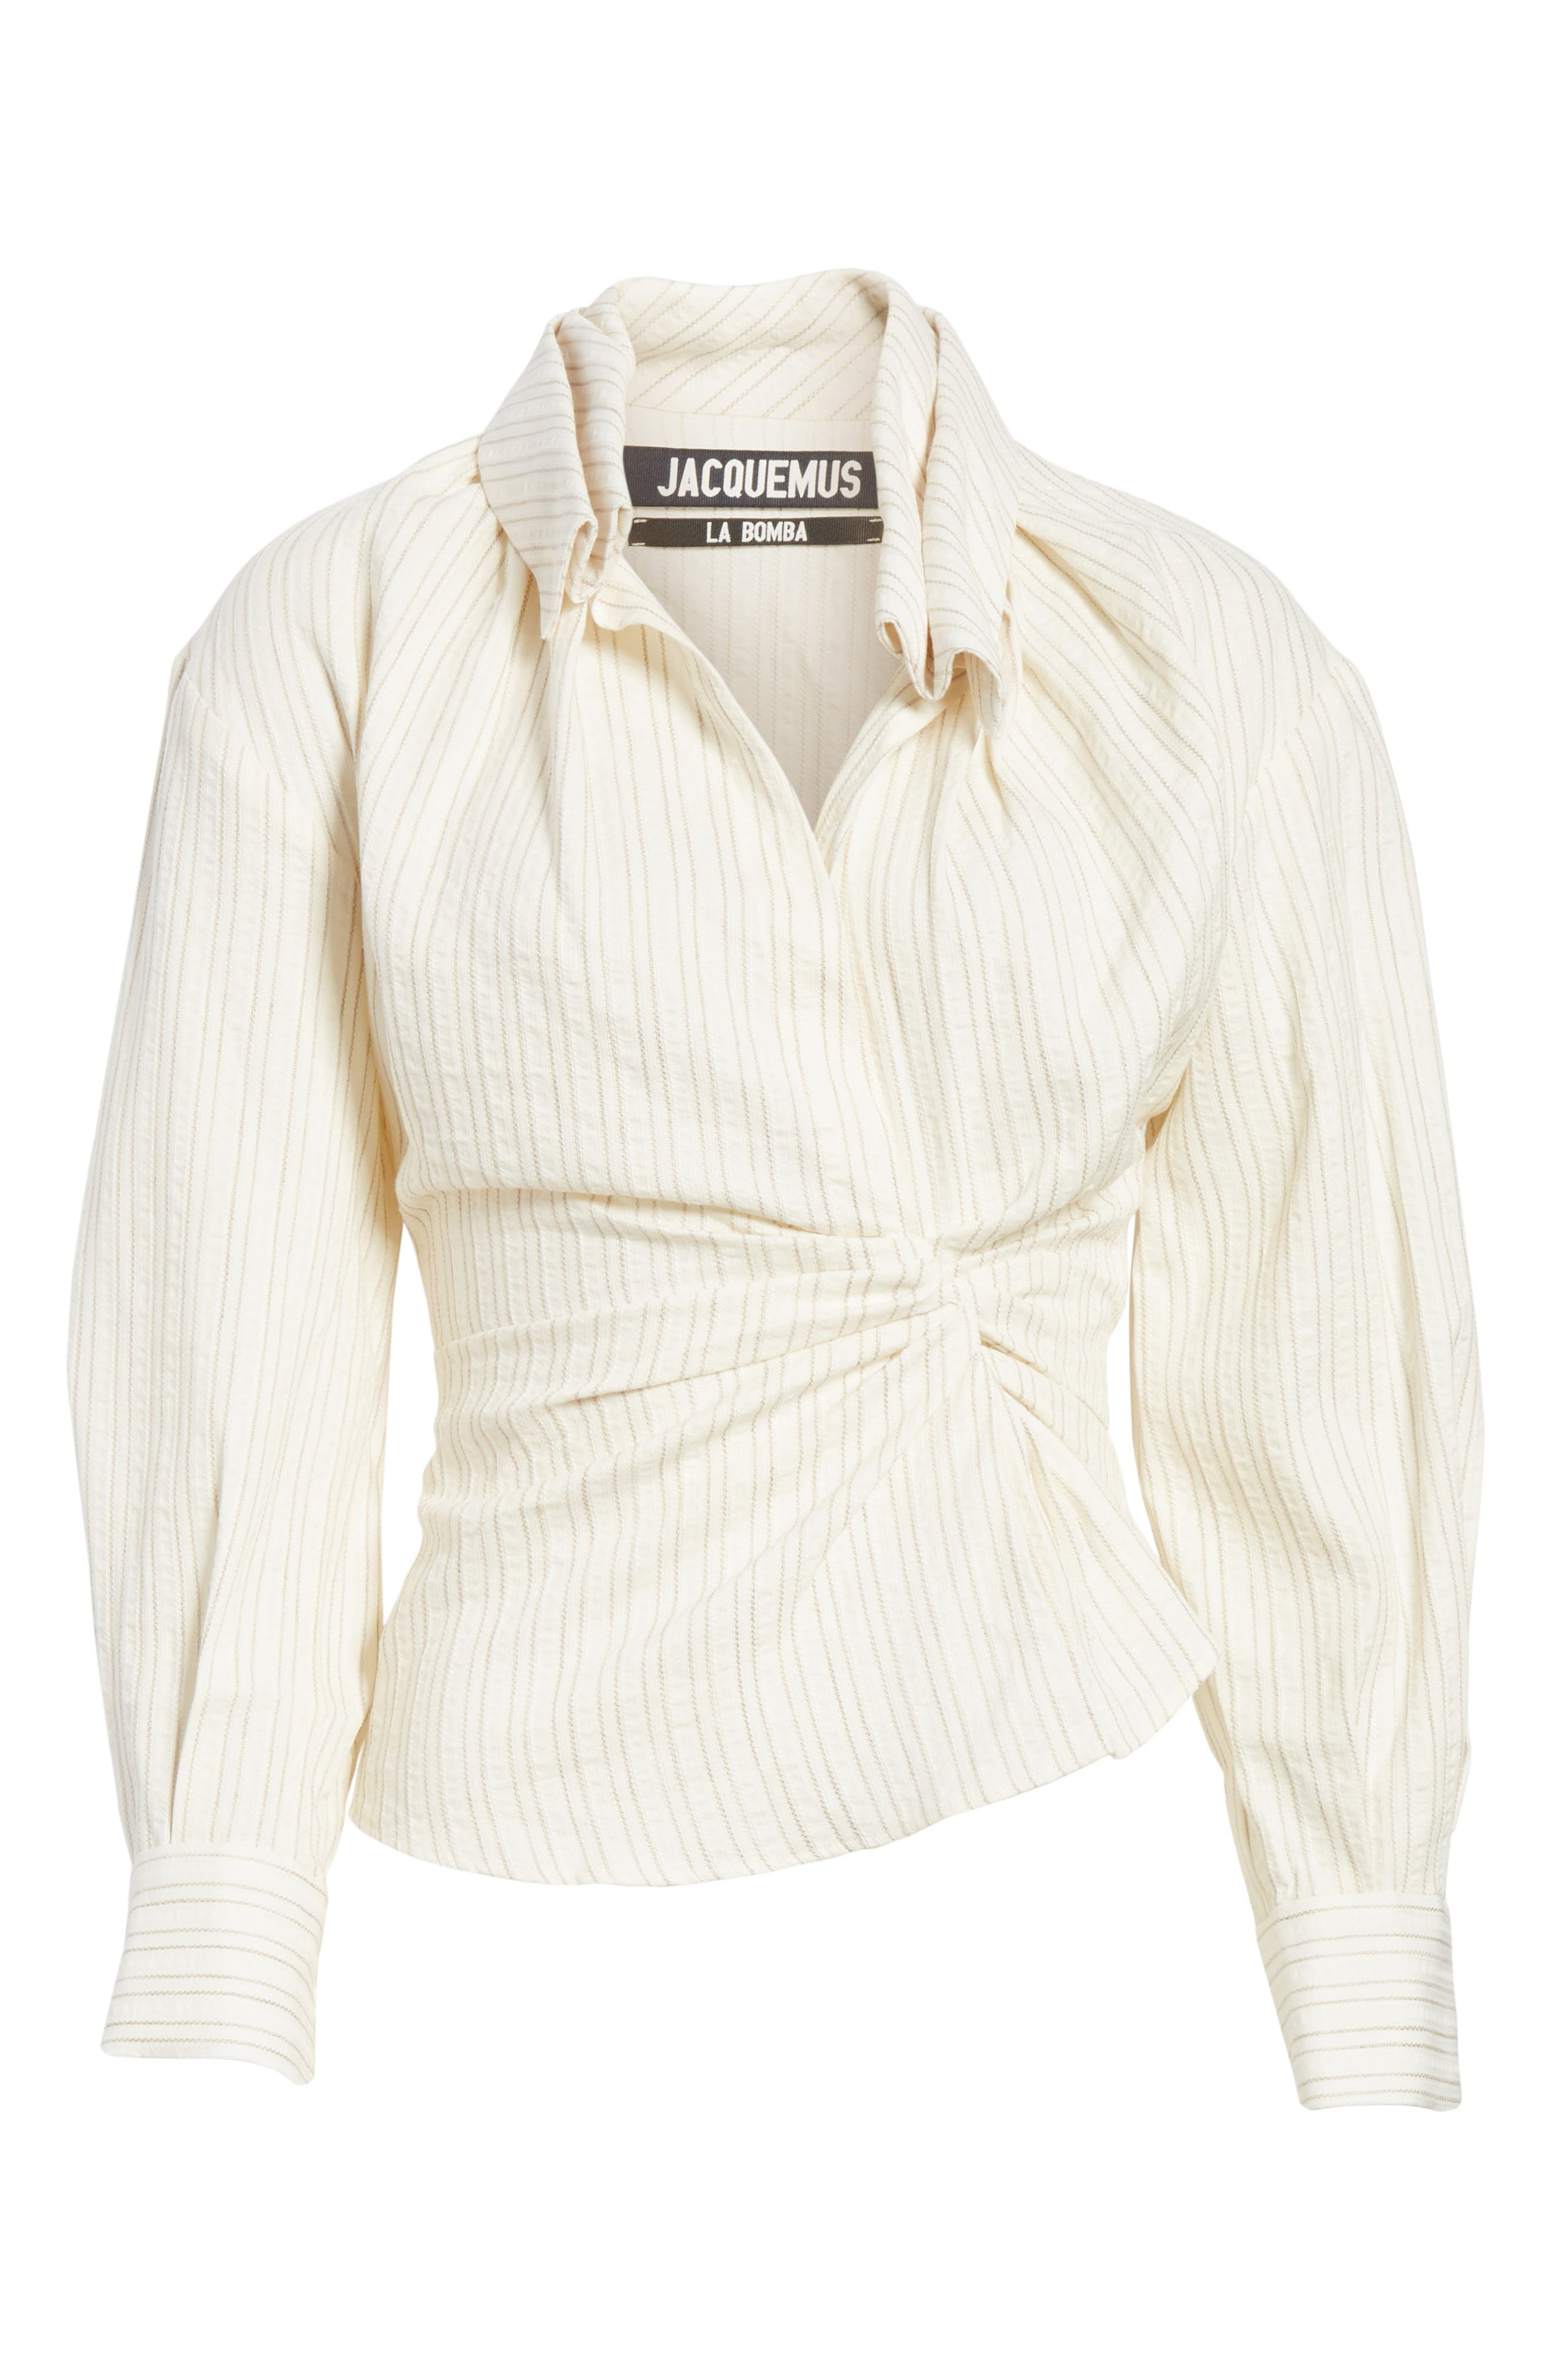 La Chemise Belem Shirt,                             Alternate thumbnail 6, color,                             Beige Striped